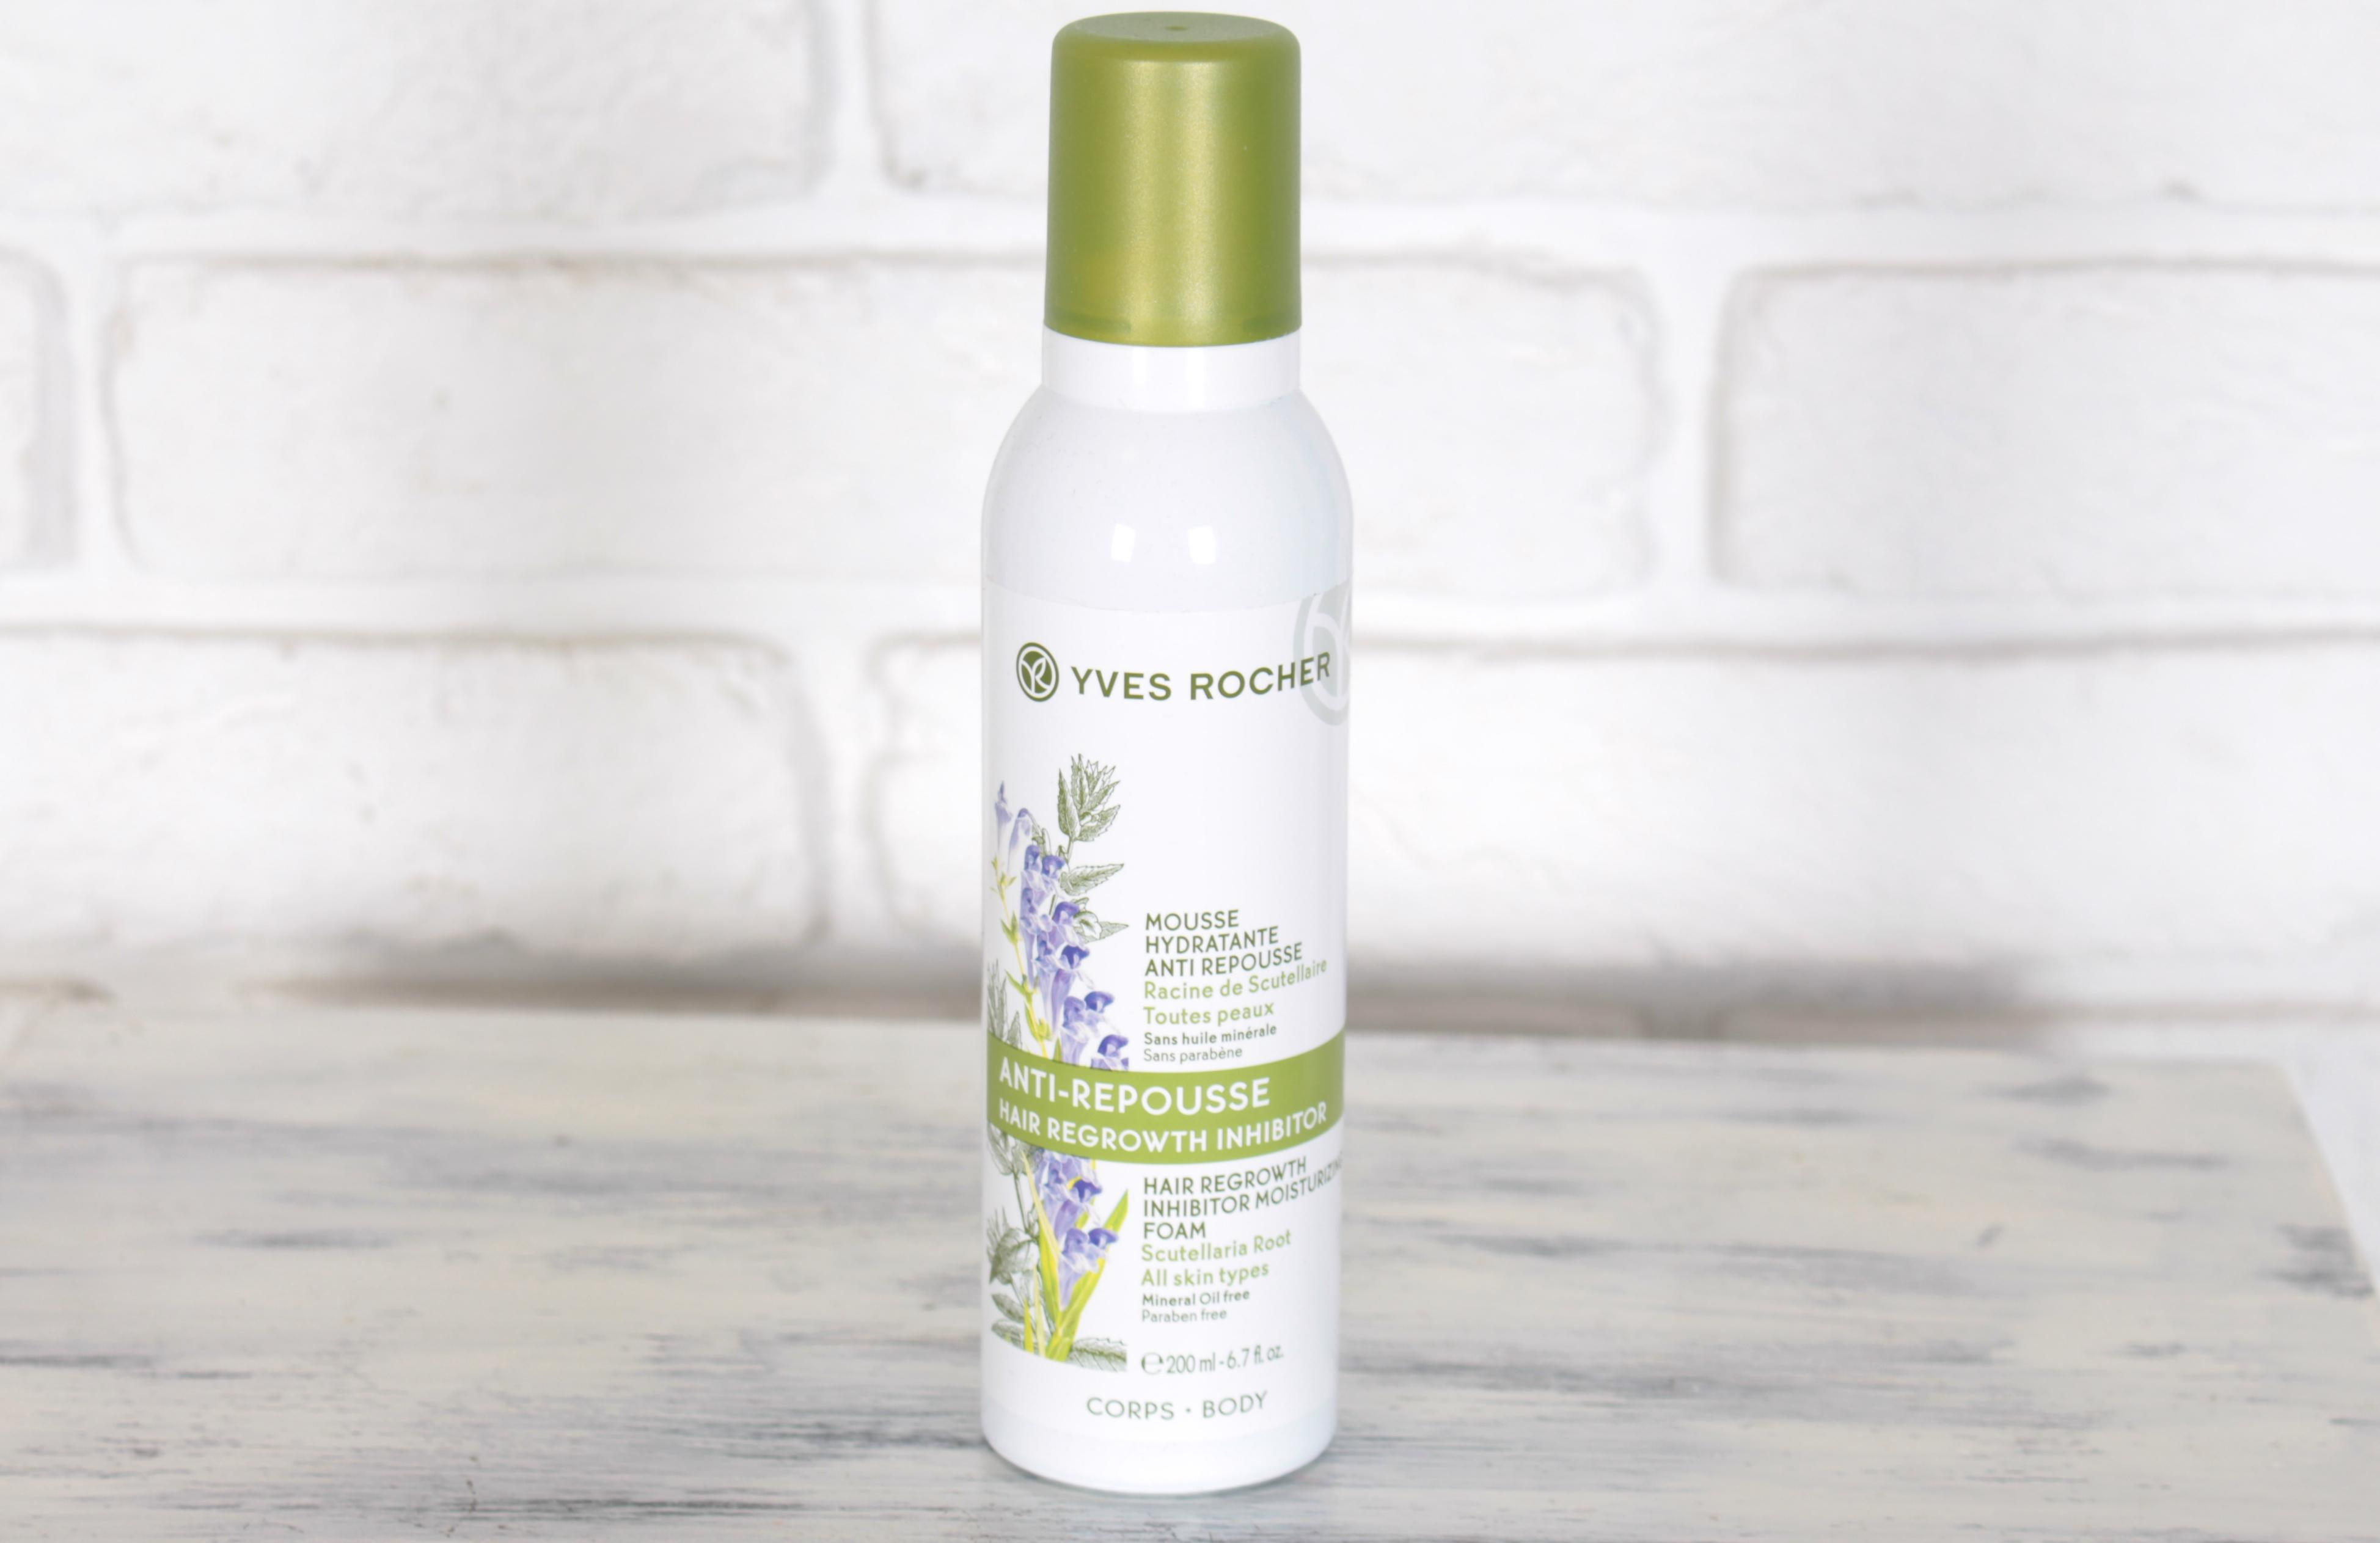 Yves Rocher Hair Regrowht Inhibitor Moisturizing Foam Увлажняющий мусс для замедления роста волос